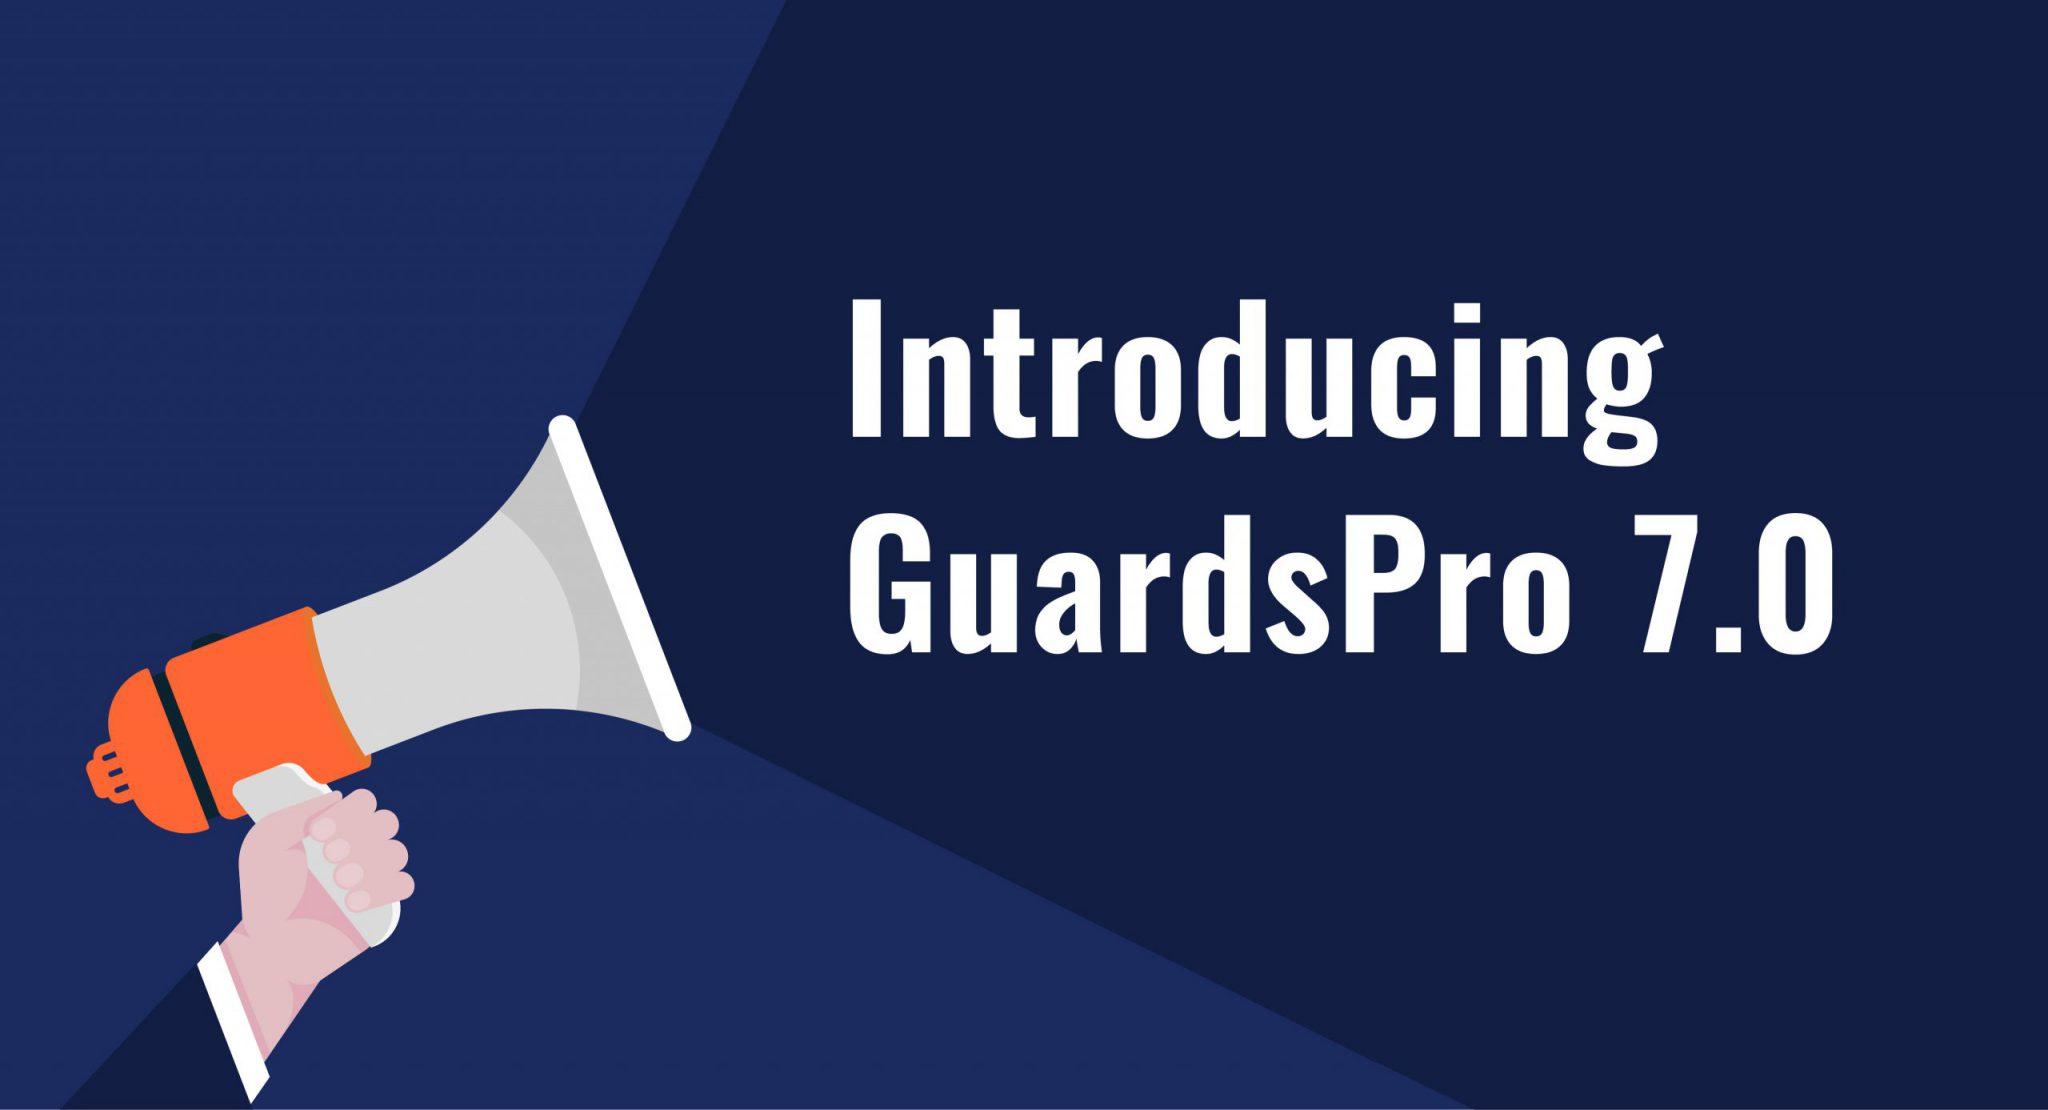 GuardsPro 7.0